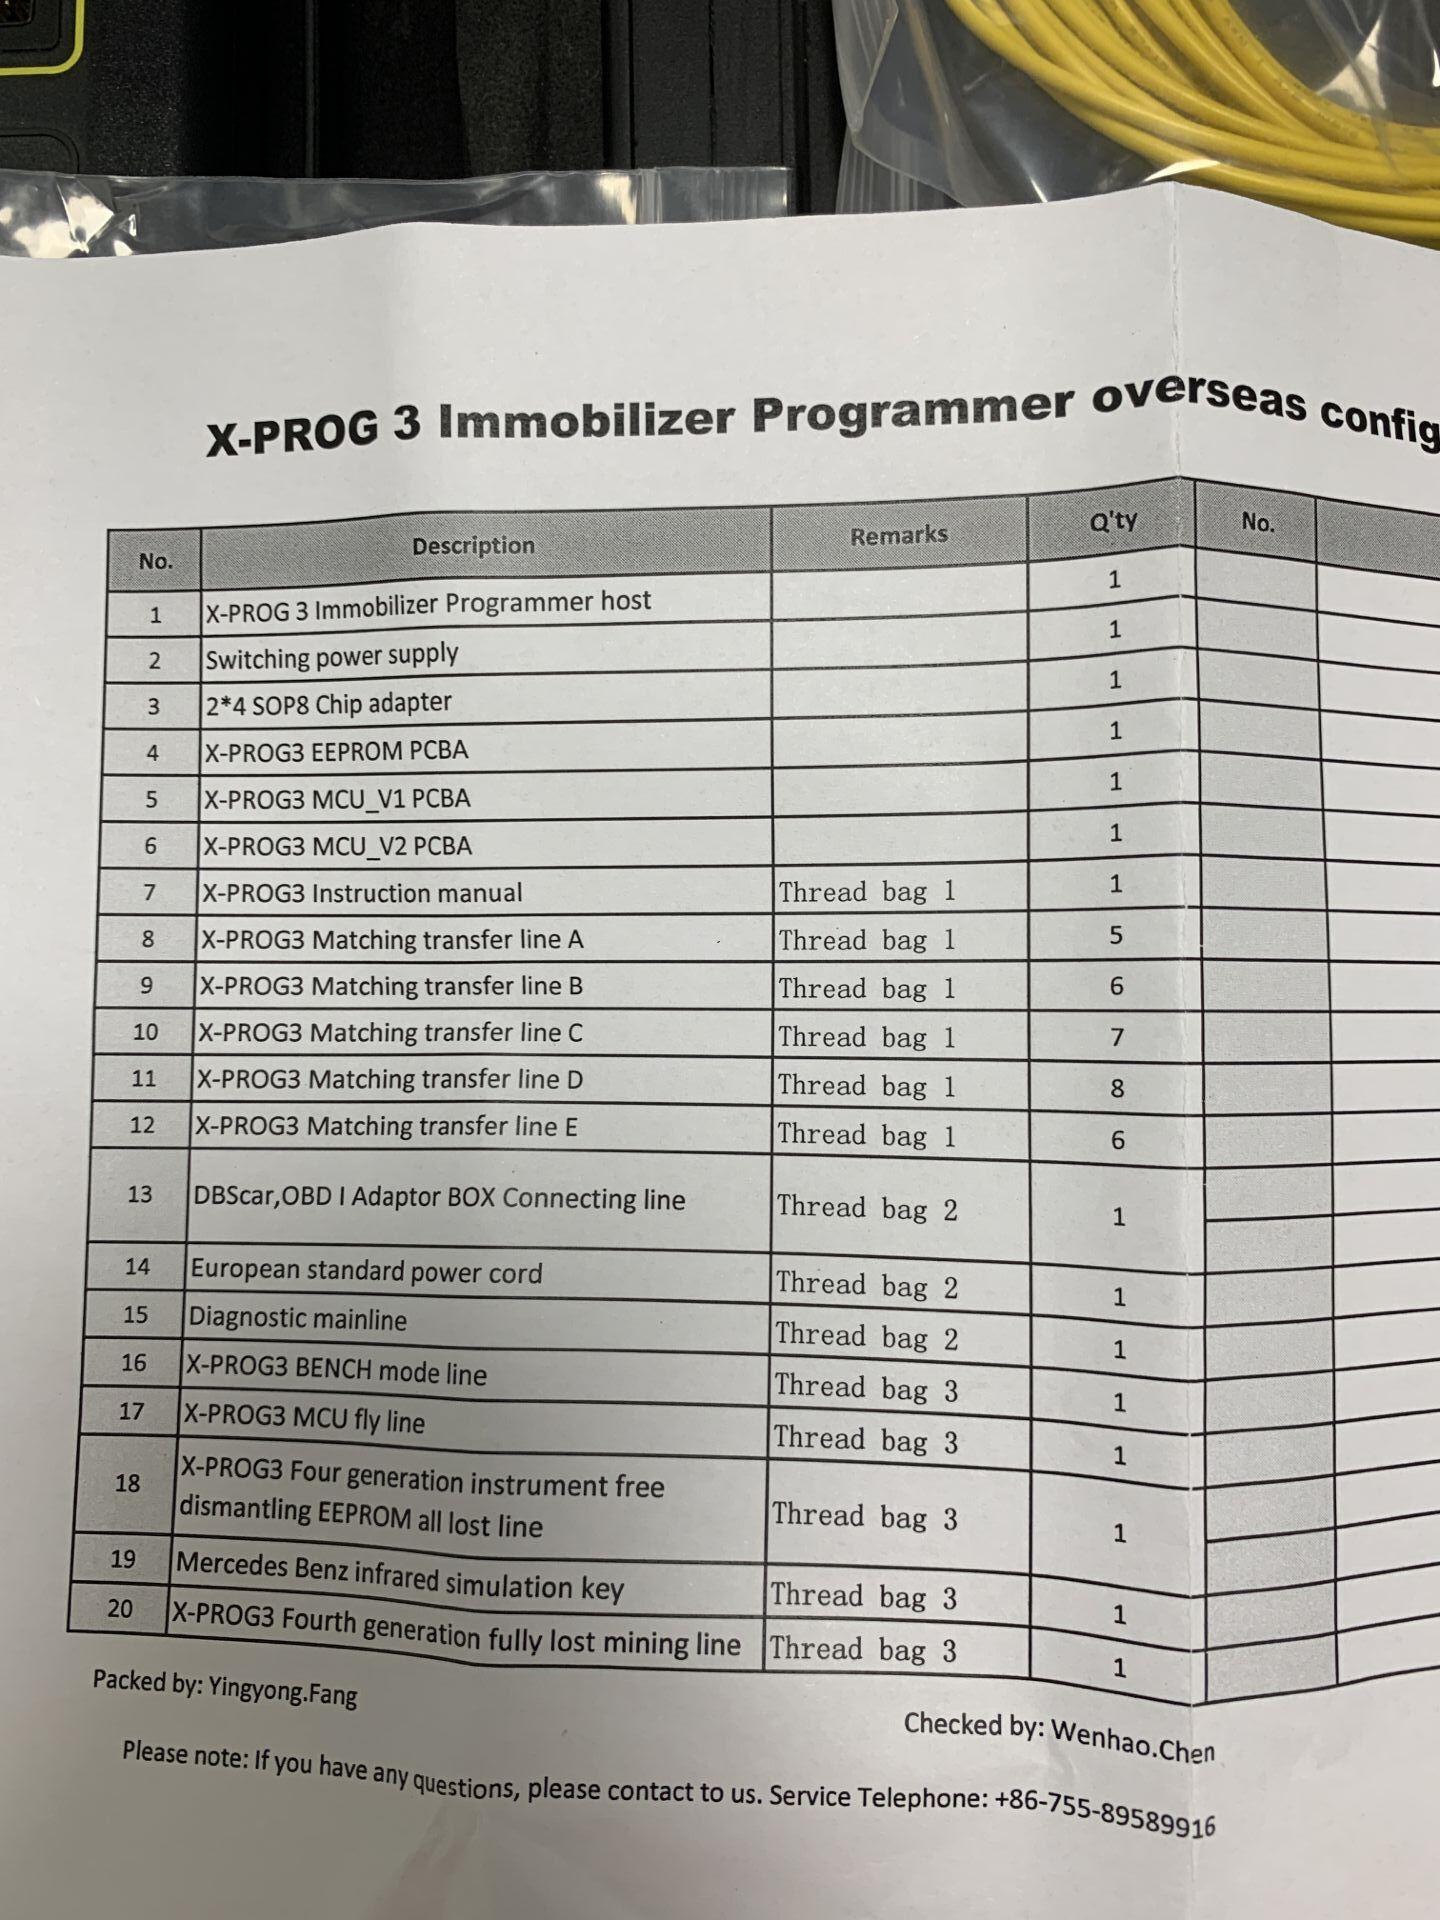 LAUNCH X-PROG 3 Package List